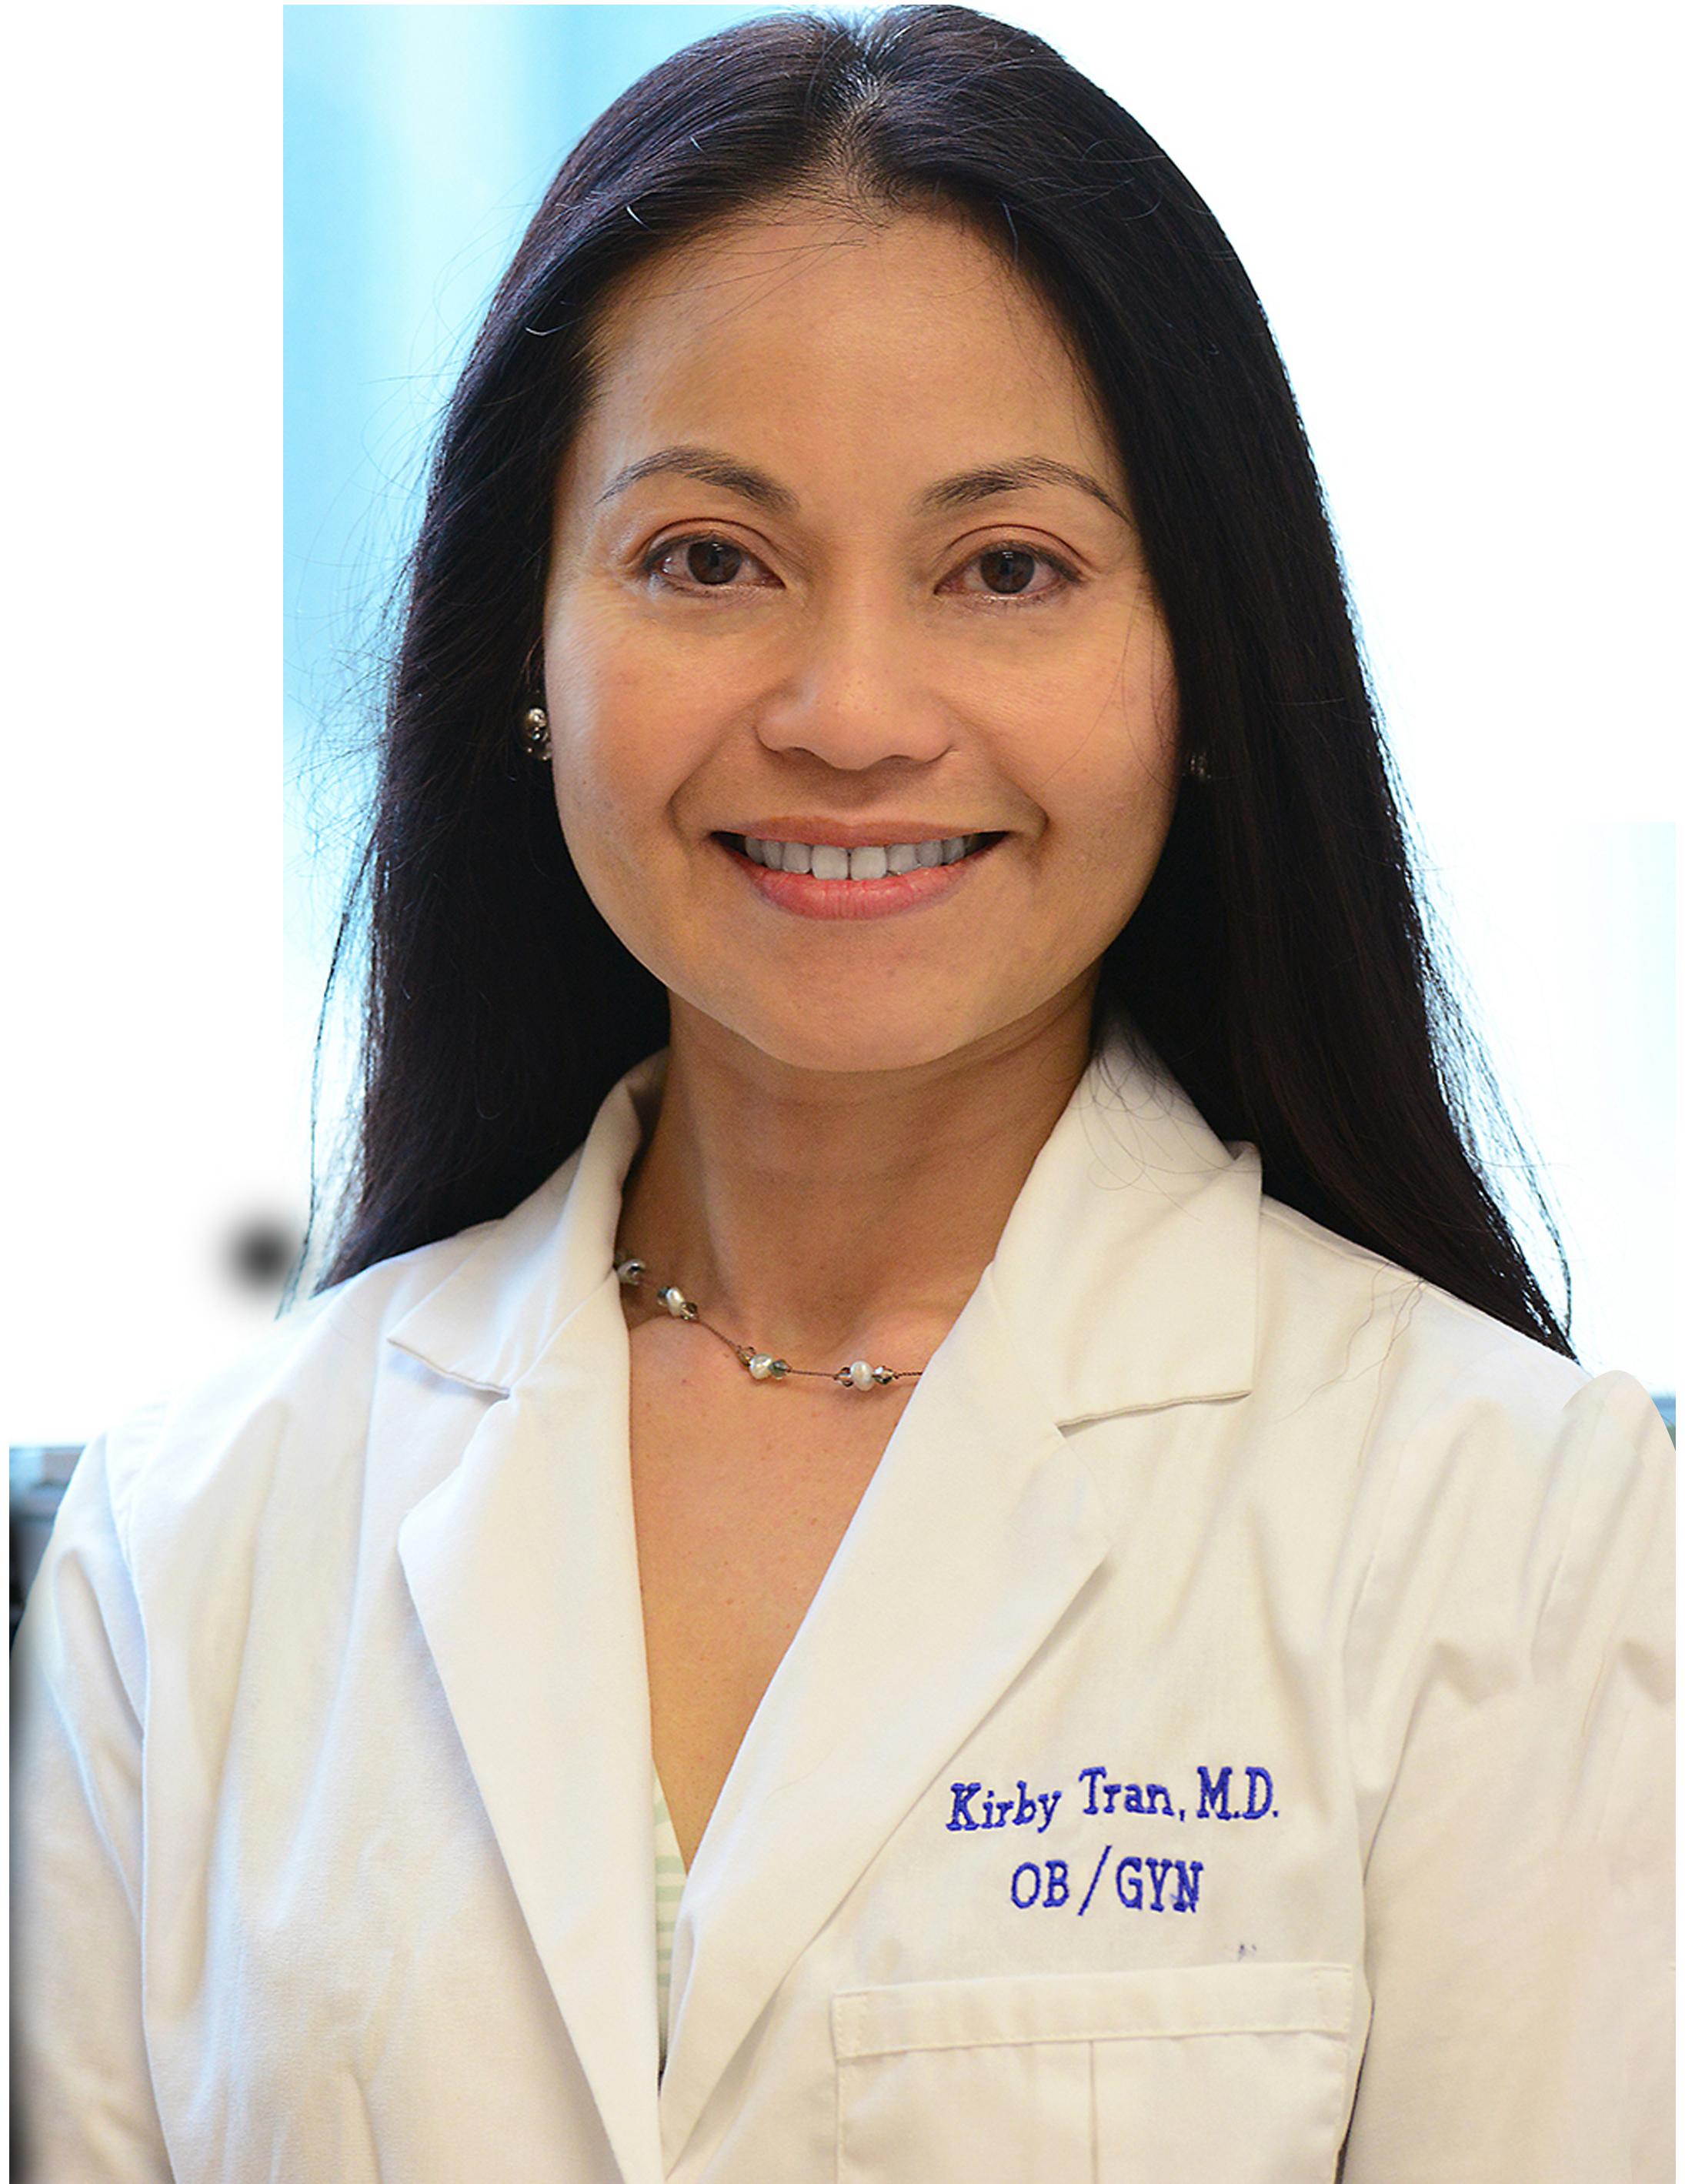 Woman Good Health - Dr. Kirby Tran